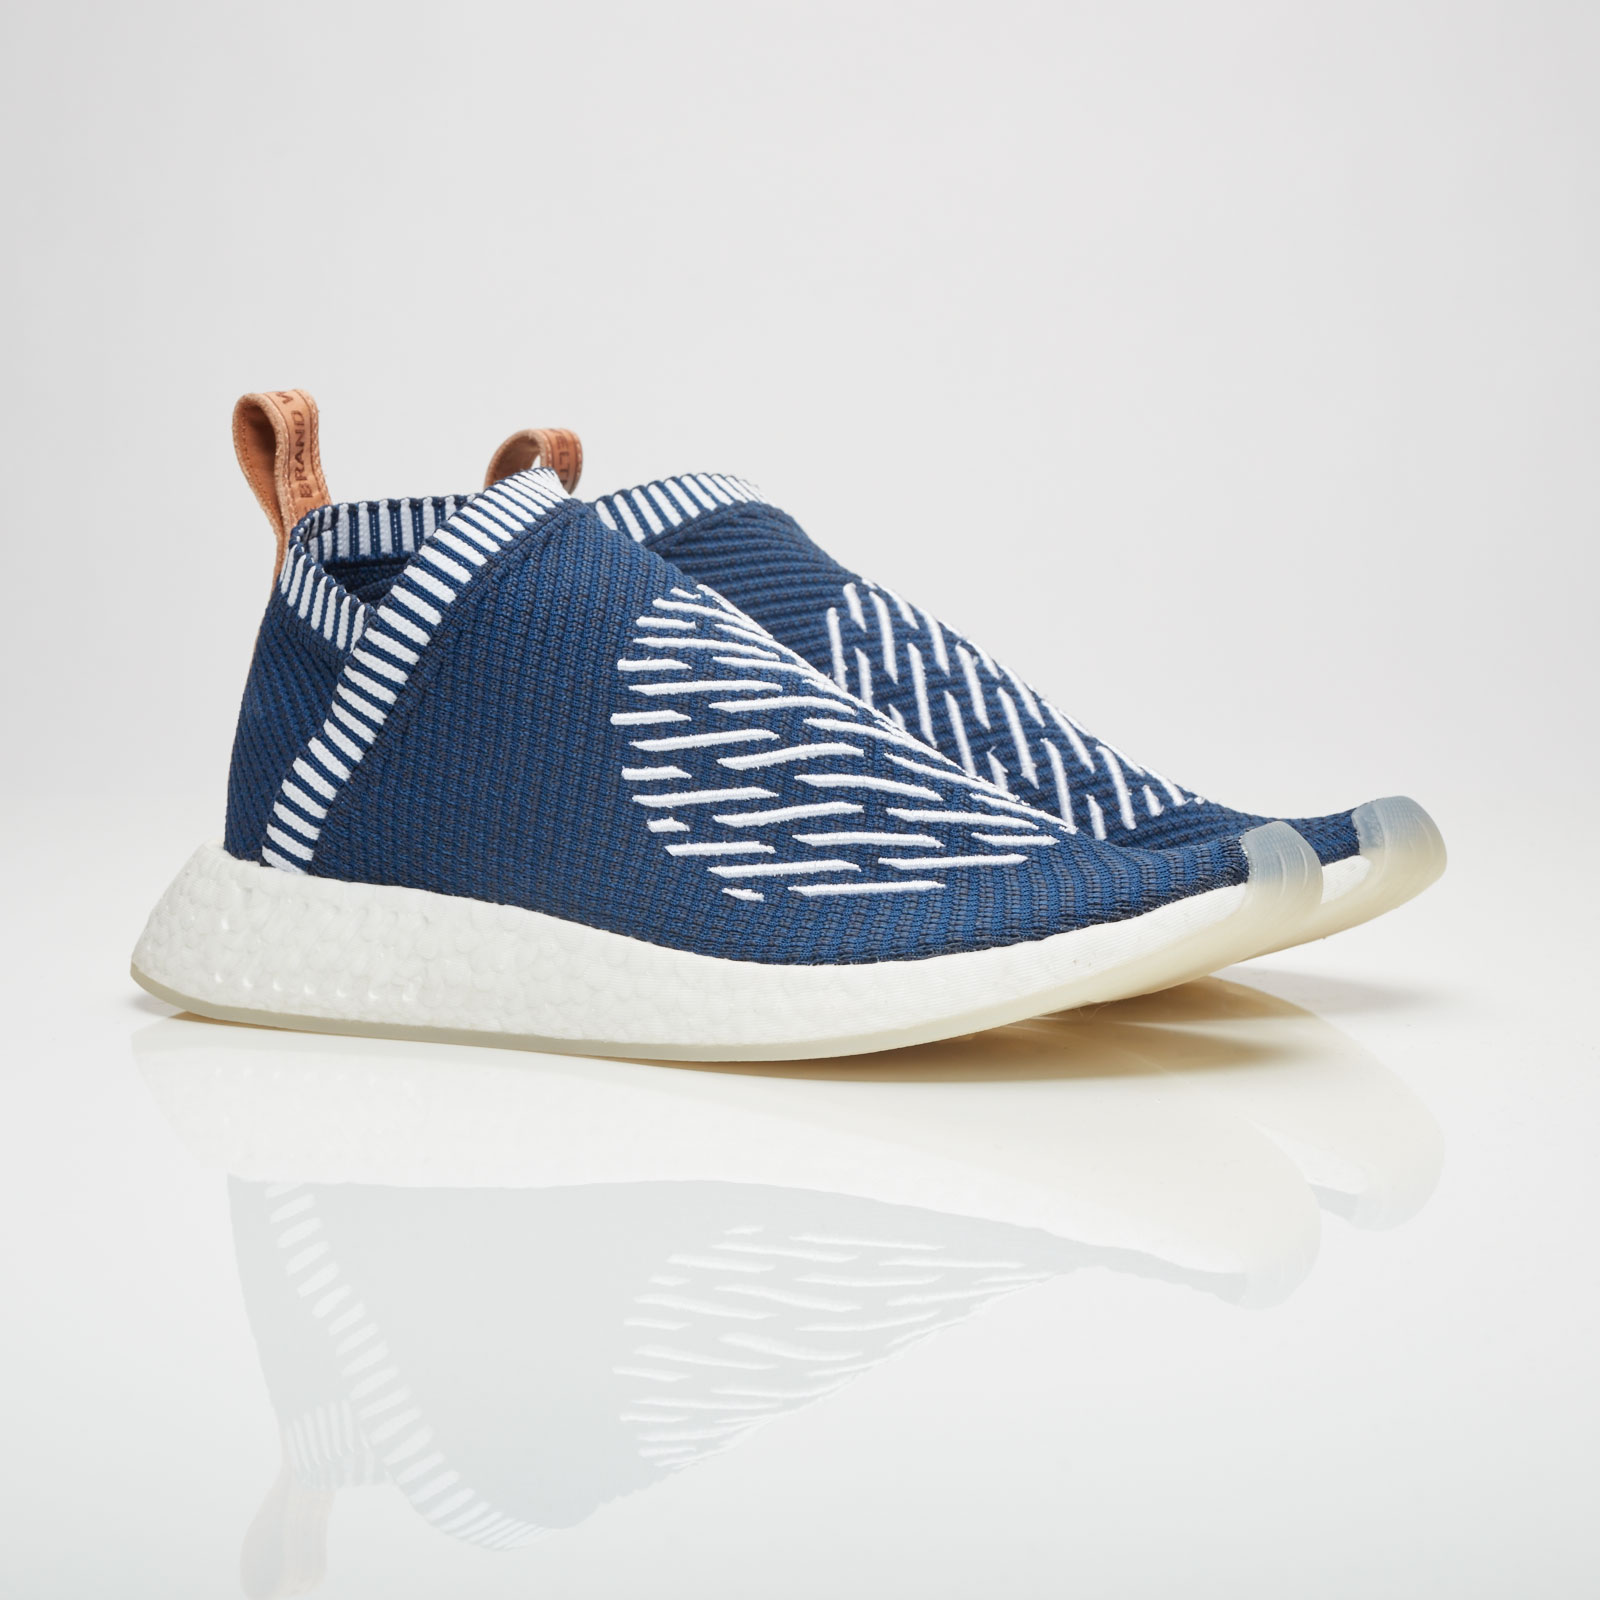 2672fa5b00e2a adidas Nmd CS2 Pk - Ba7189 - Sneakersnstuff